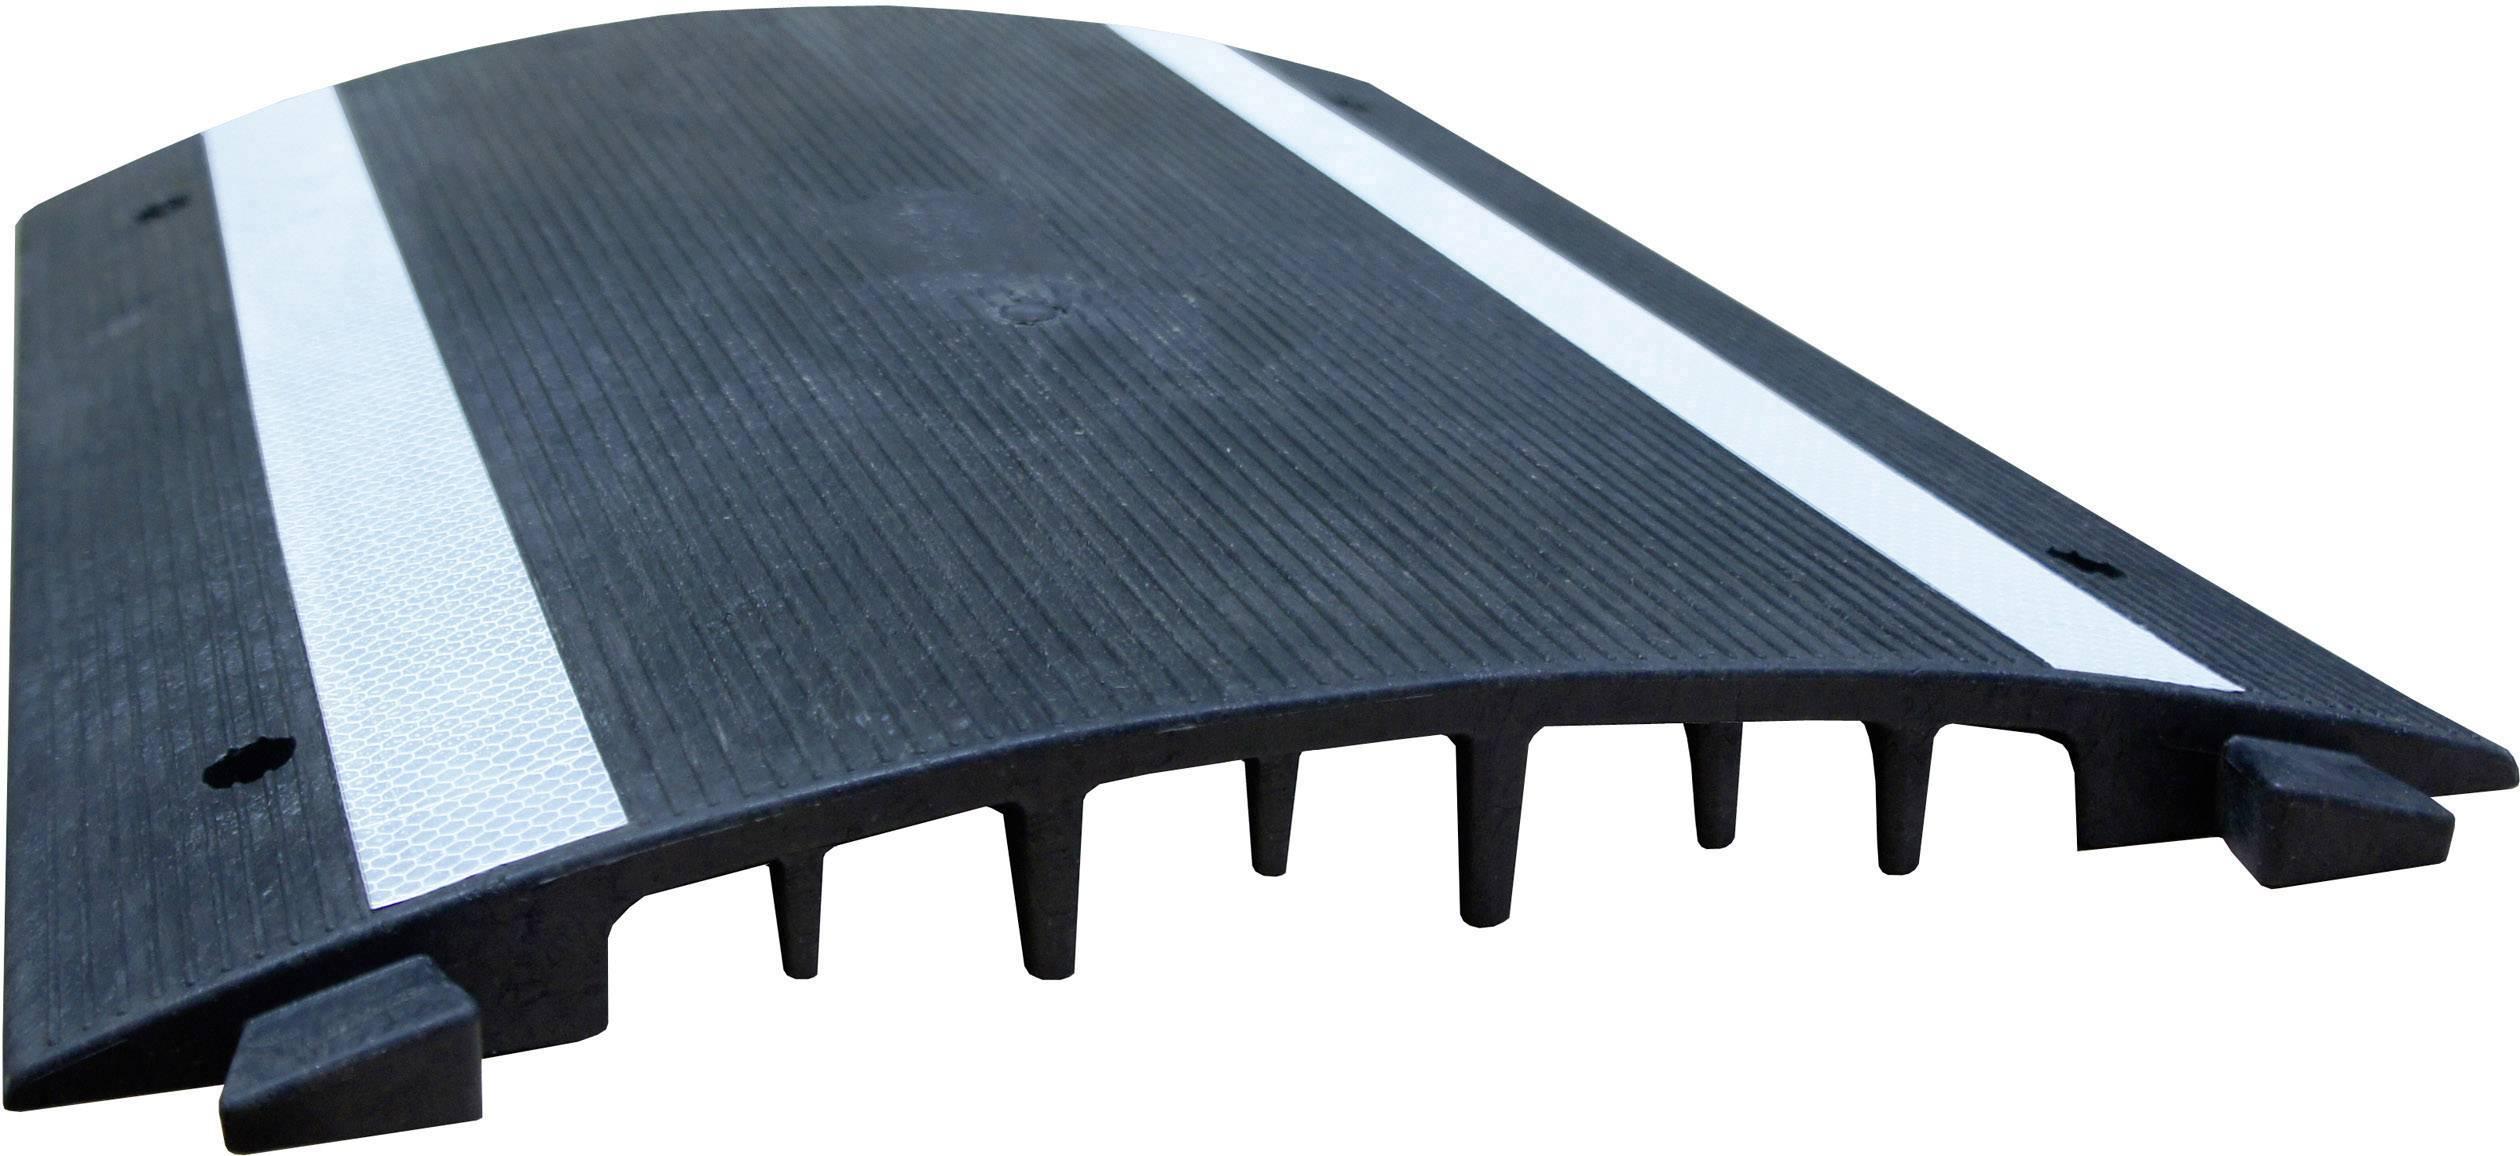 Káblový mostík VISO CP5040 (d x š x v) 500 x 400 x 40 mm, čierna, 1 ks